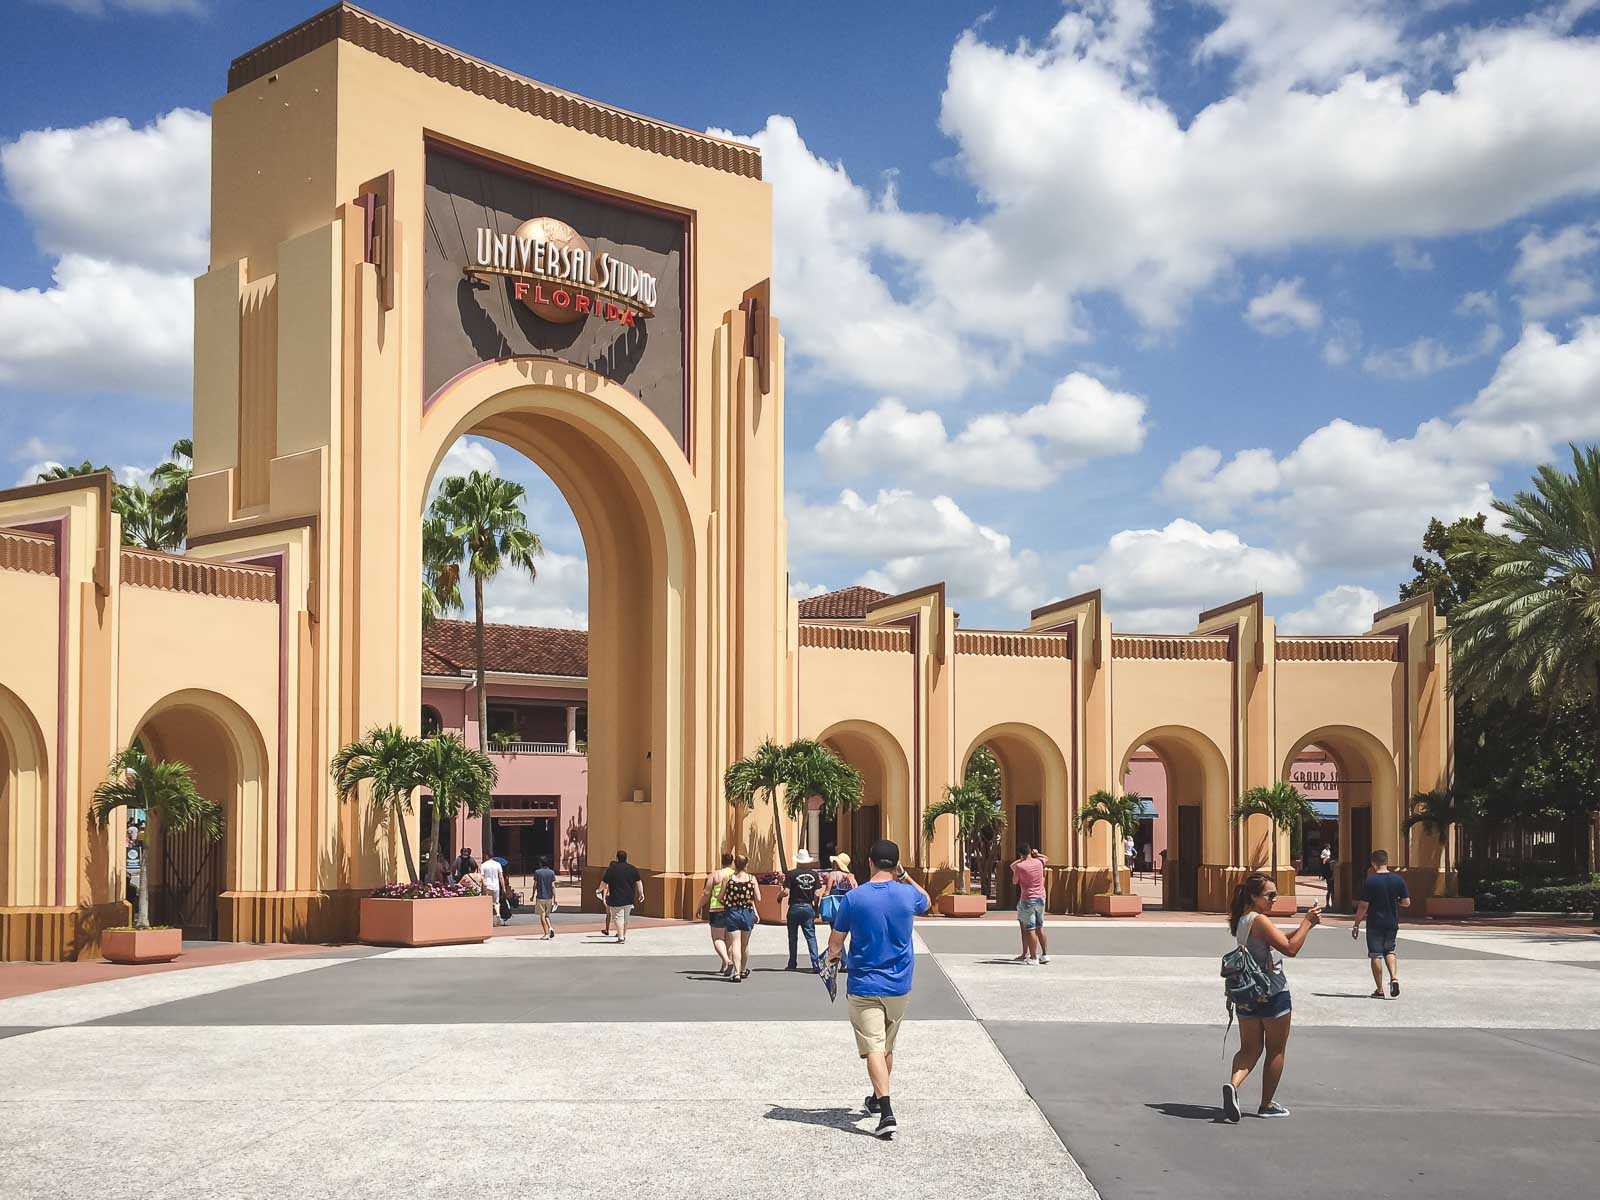 Universal Studios near Orlando Florida